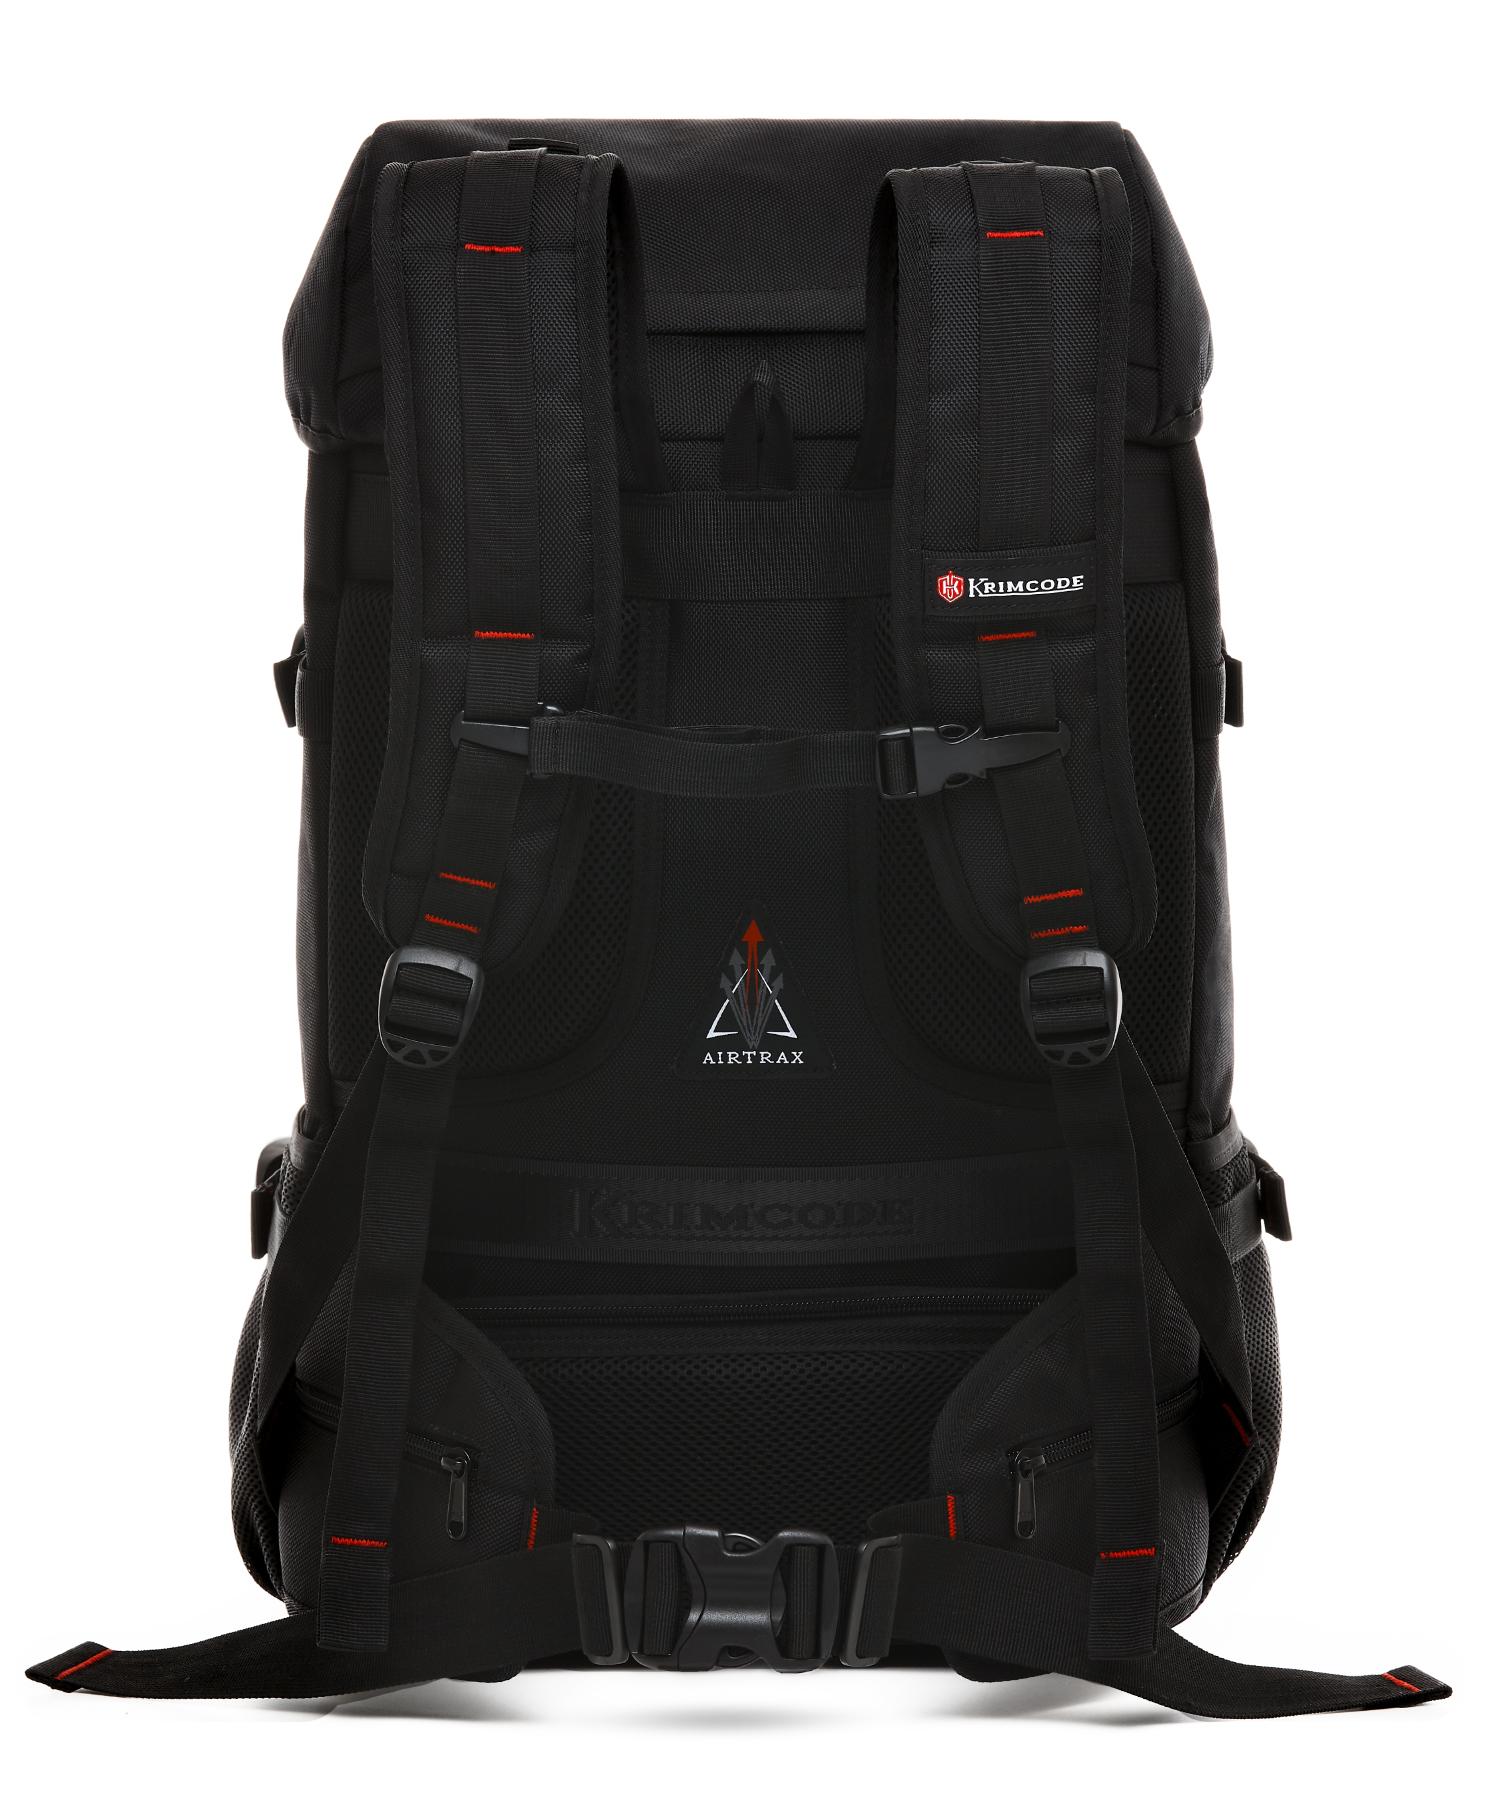 back perspective of krimcode backpack